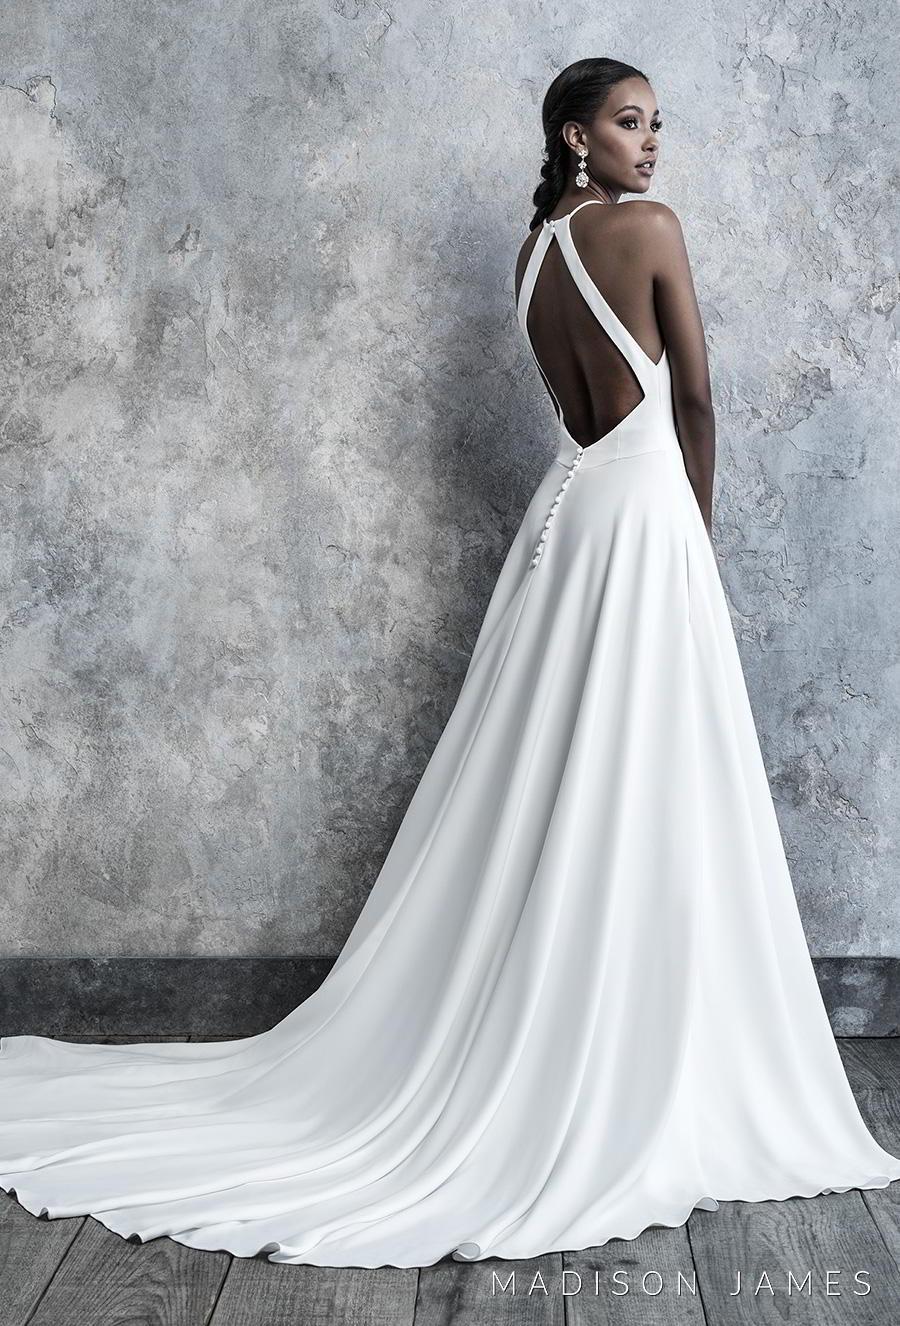 madison james 2019 bridal sleeveless halter neck simple minimalist elegant classy a line wedding dress keyhole back chapel train (518) bv